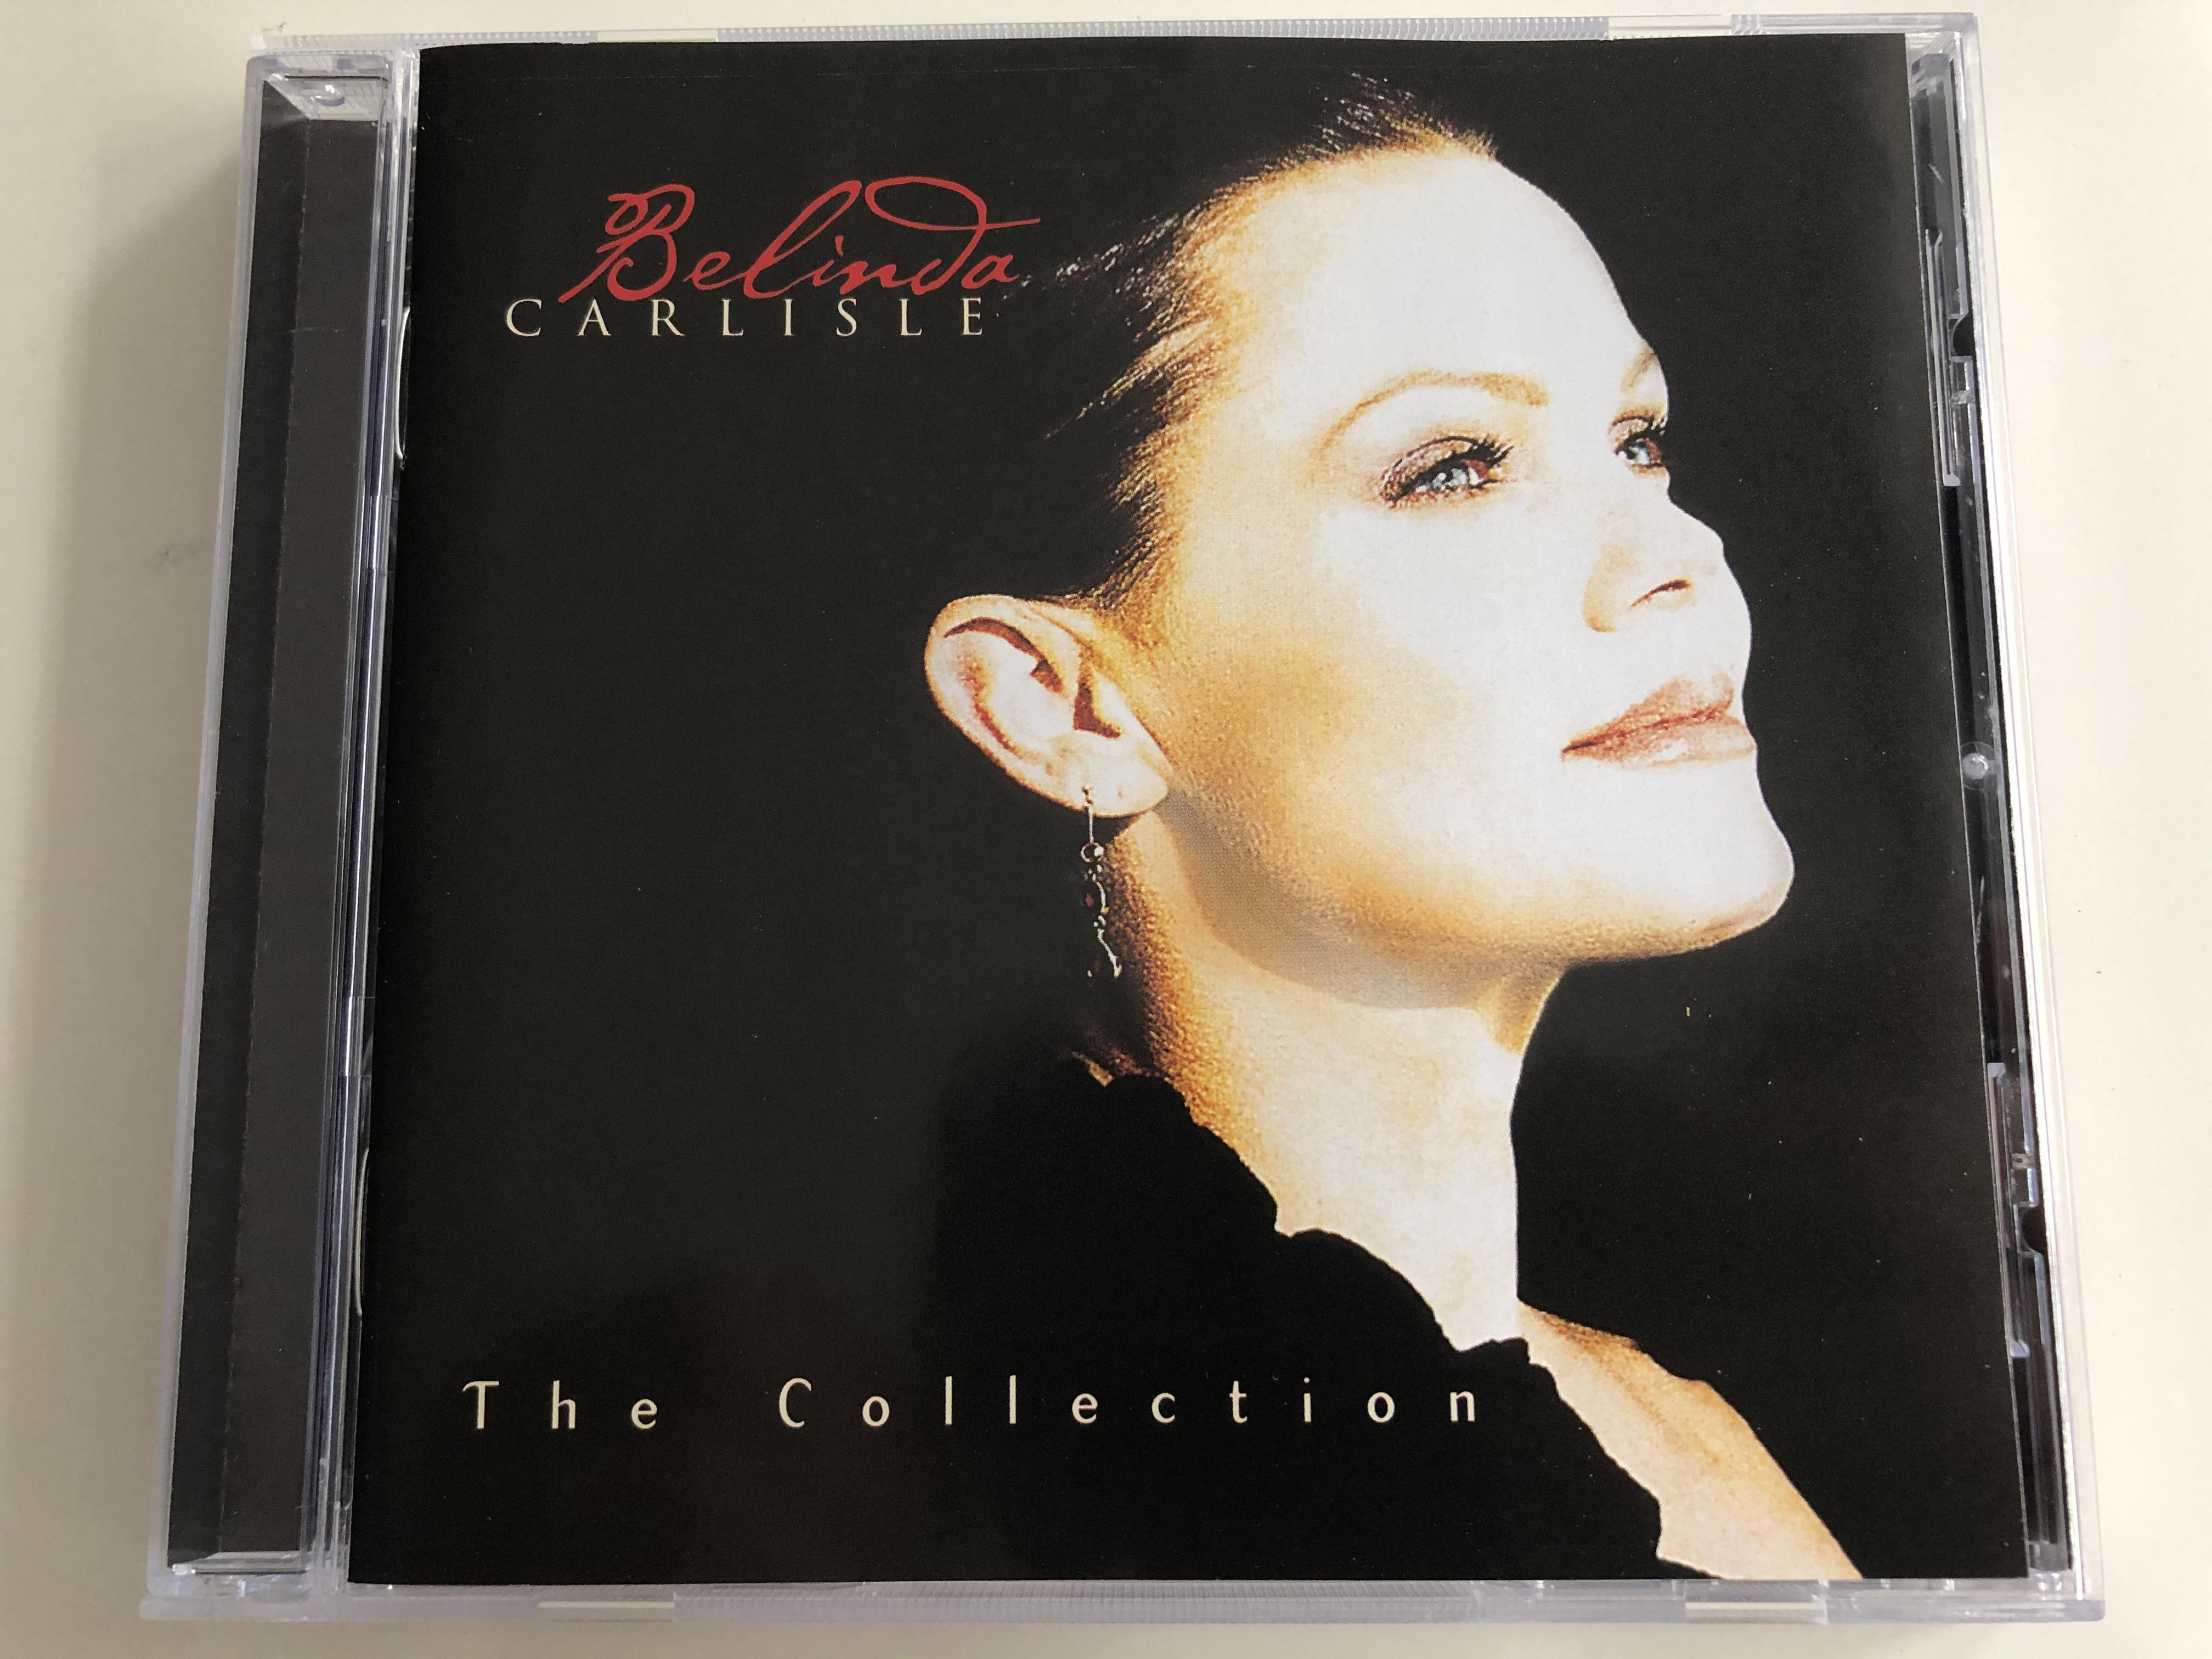 belinda-carlisle-the-collection-virgin-audio-cd-2002-cdv2955-1-.jpg